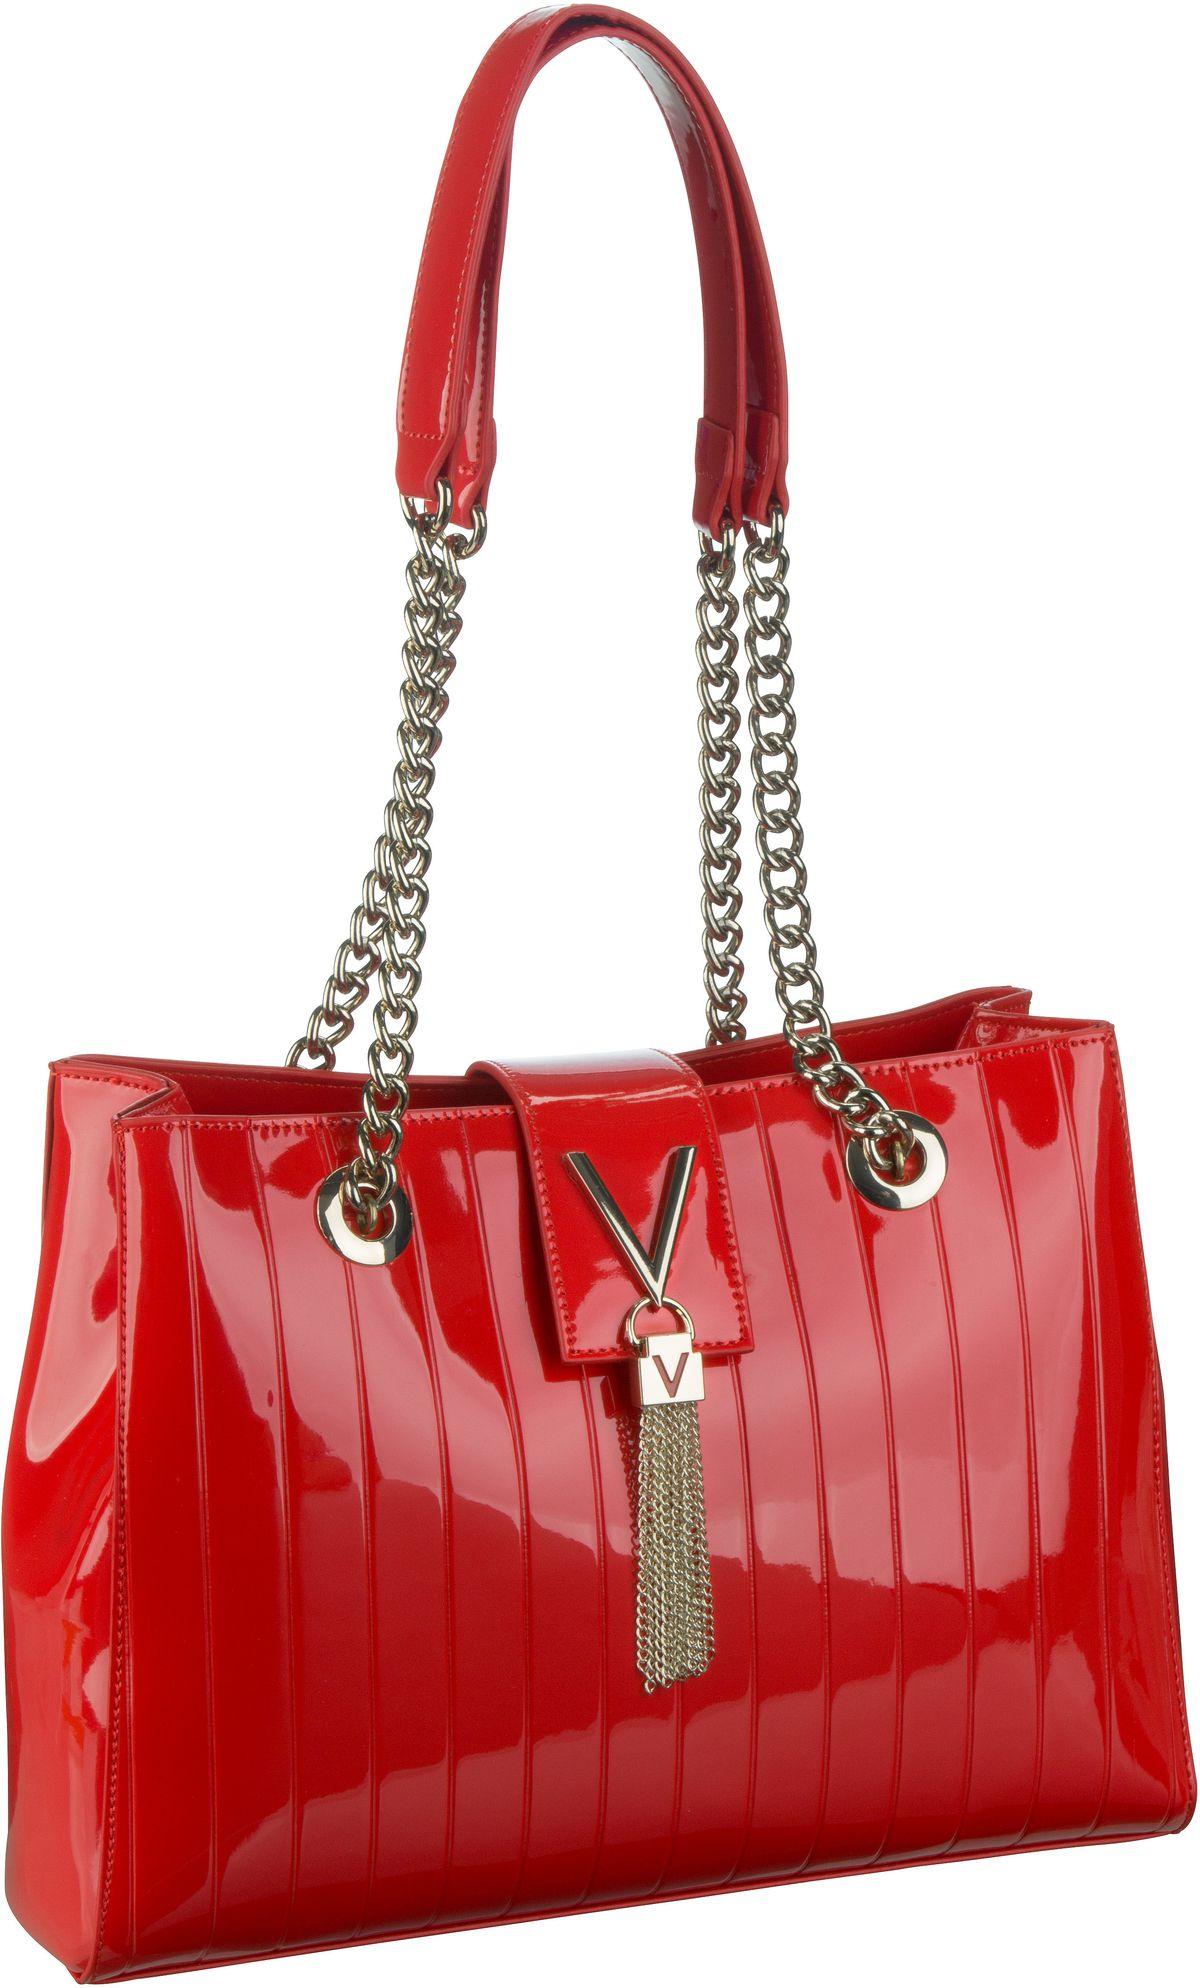 Bags Handtasche Bongo Shopping K06 Rosso